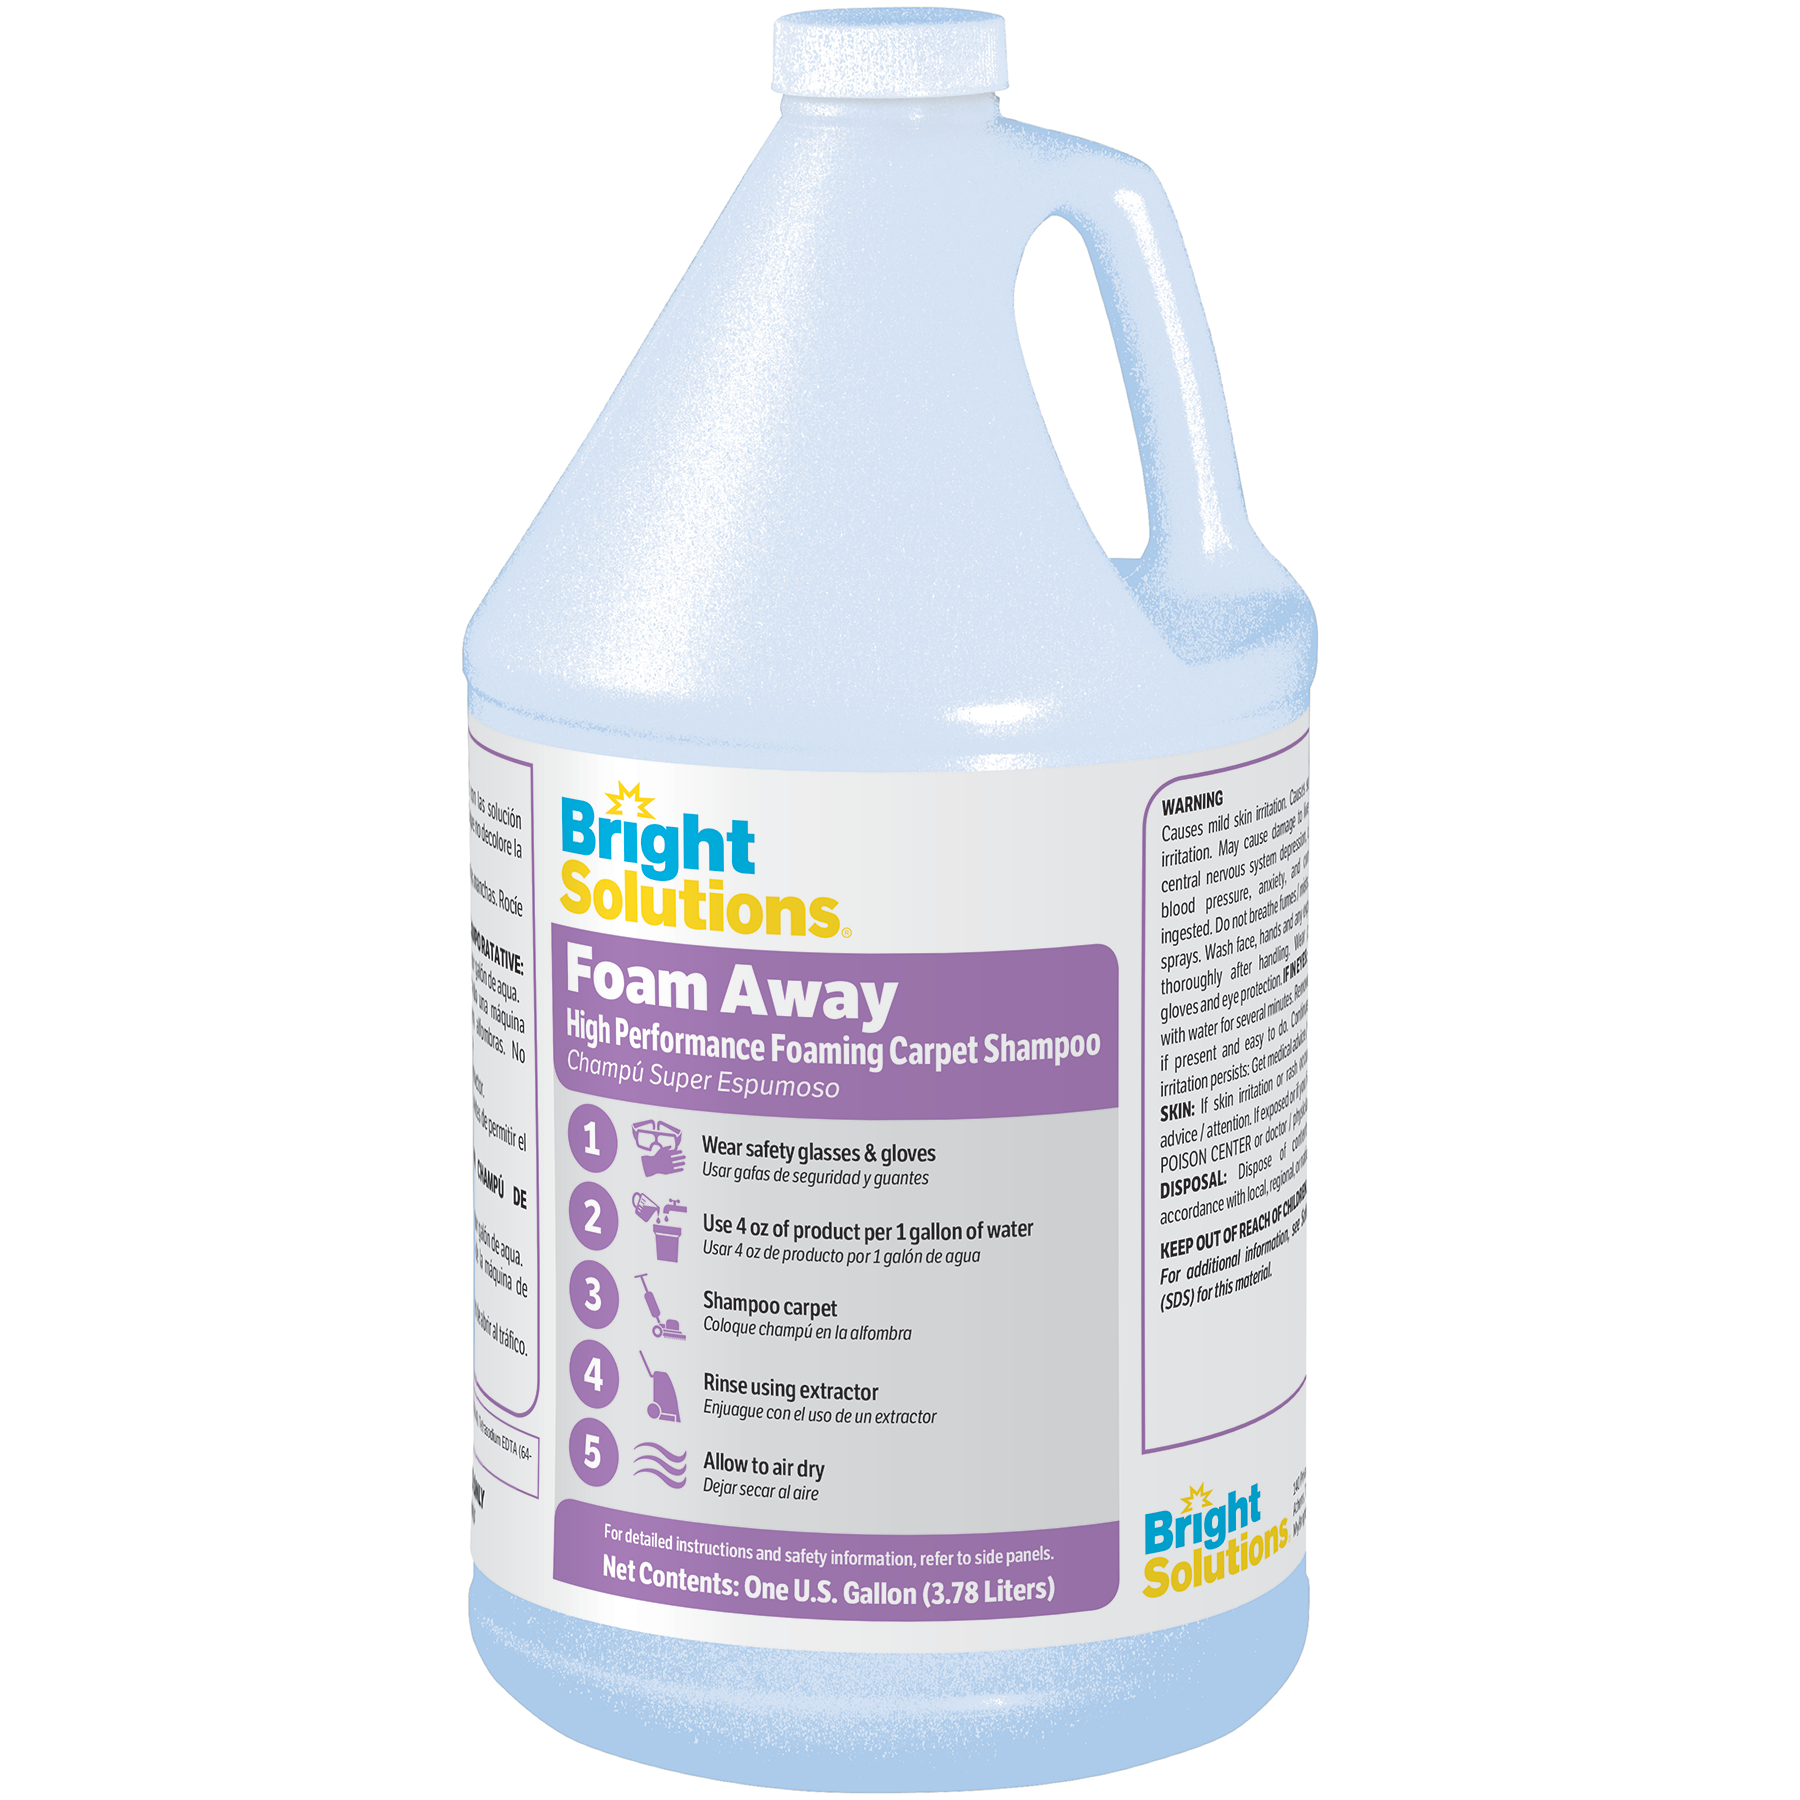 Bright Solutions® Foam Away — High Performance Foaming Carpet Shampoo - 4/1Gal